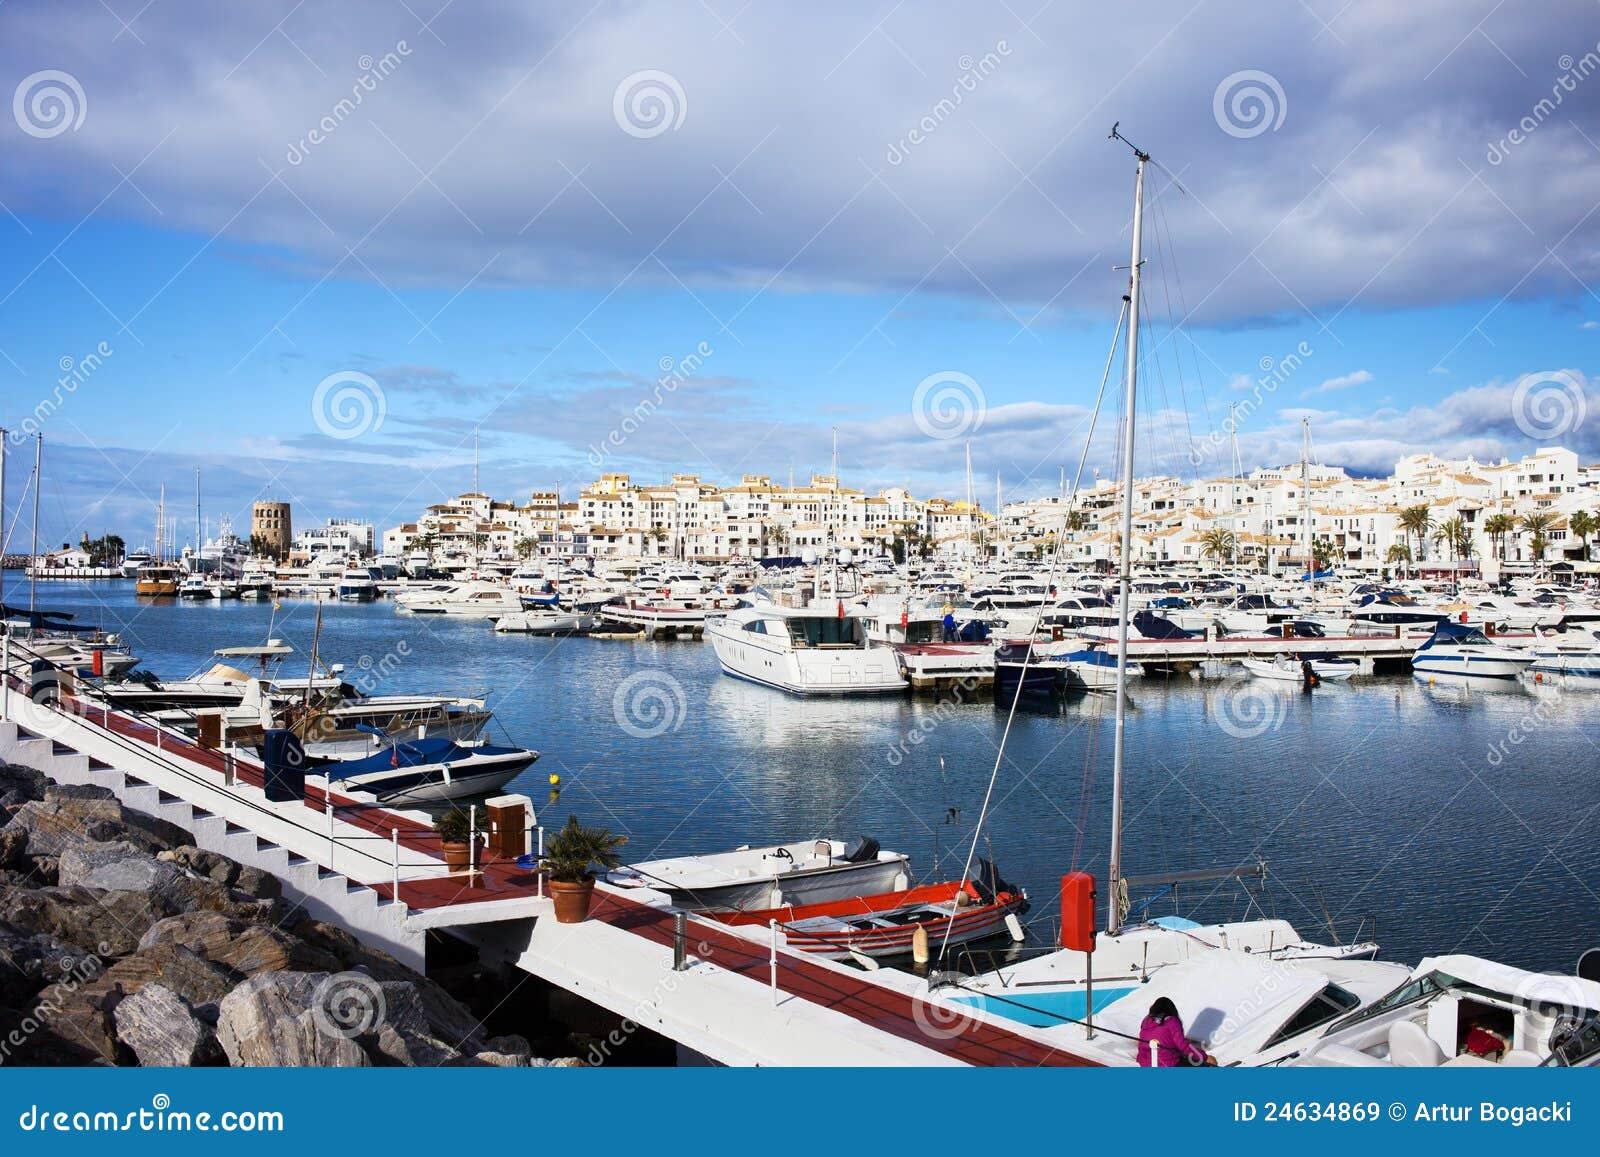 Puerto Banus On Costa Del Sol Stock Image Image Of